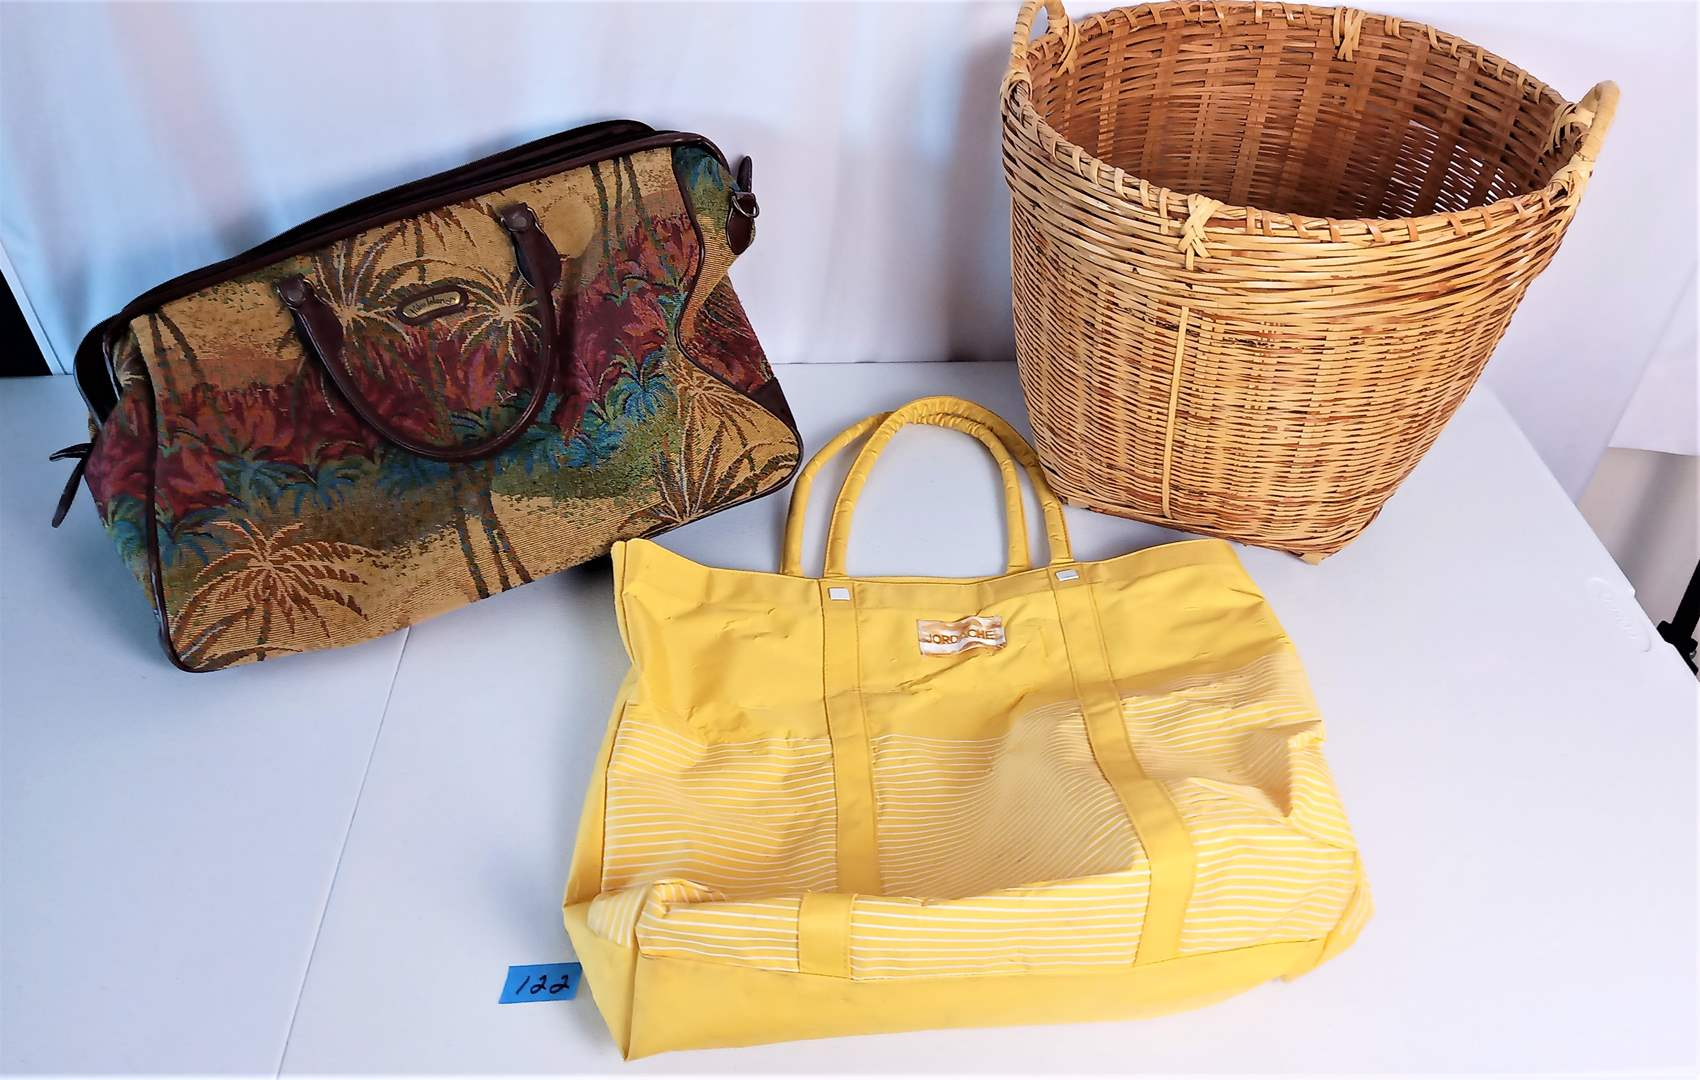 Lot # 122 Palm Island Facric Shoulder Bag, Jordche Bag, Wicker Basket with handles